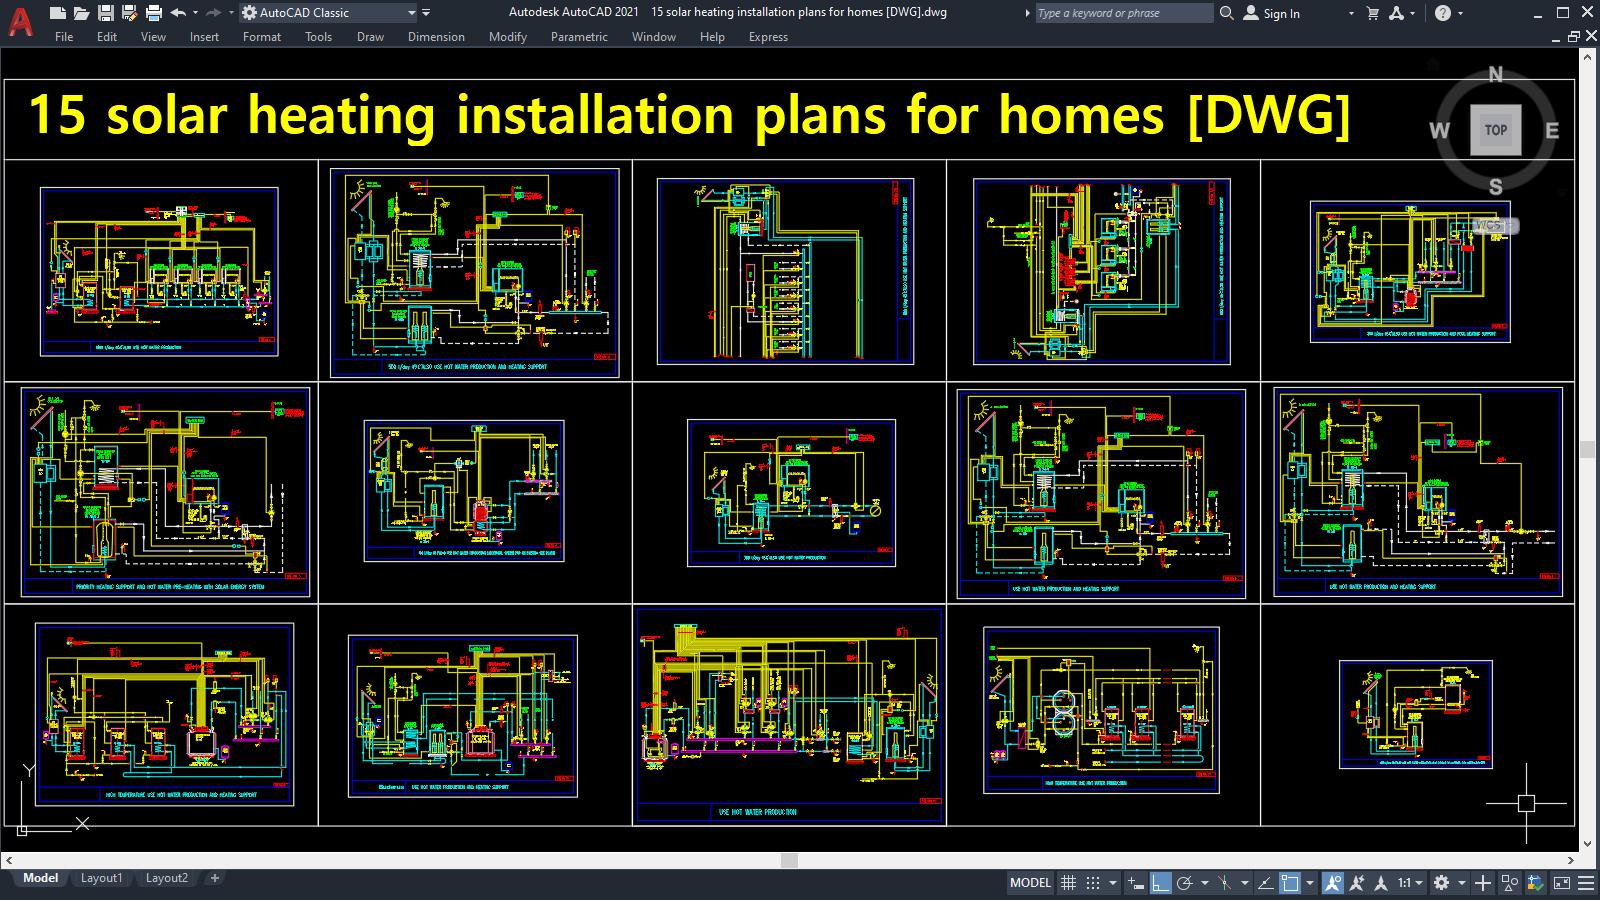 15 solar heating installation plans for homes [DWG]